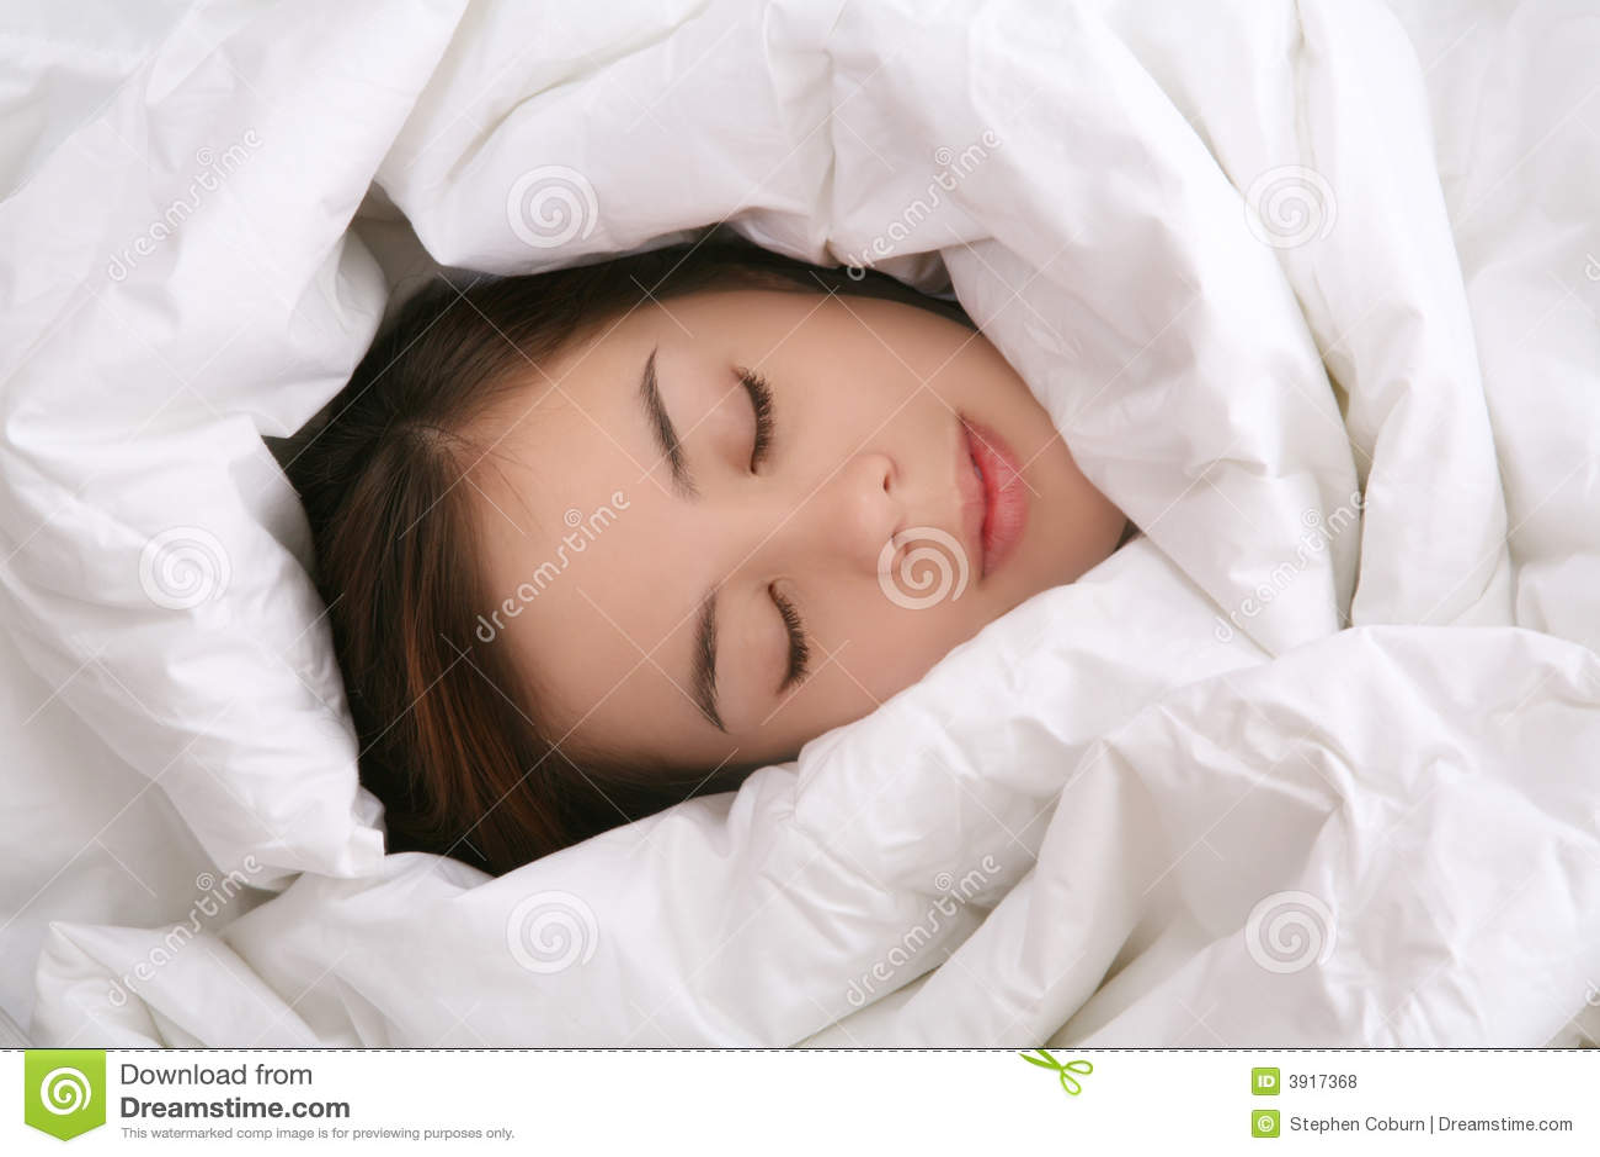 Girl In Blanket Sleeping Royalty Free Stock Photos - Image: 3917368